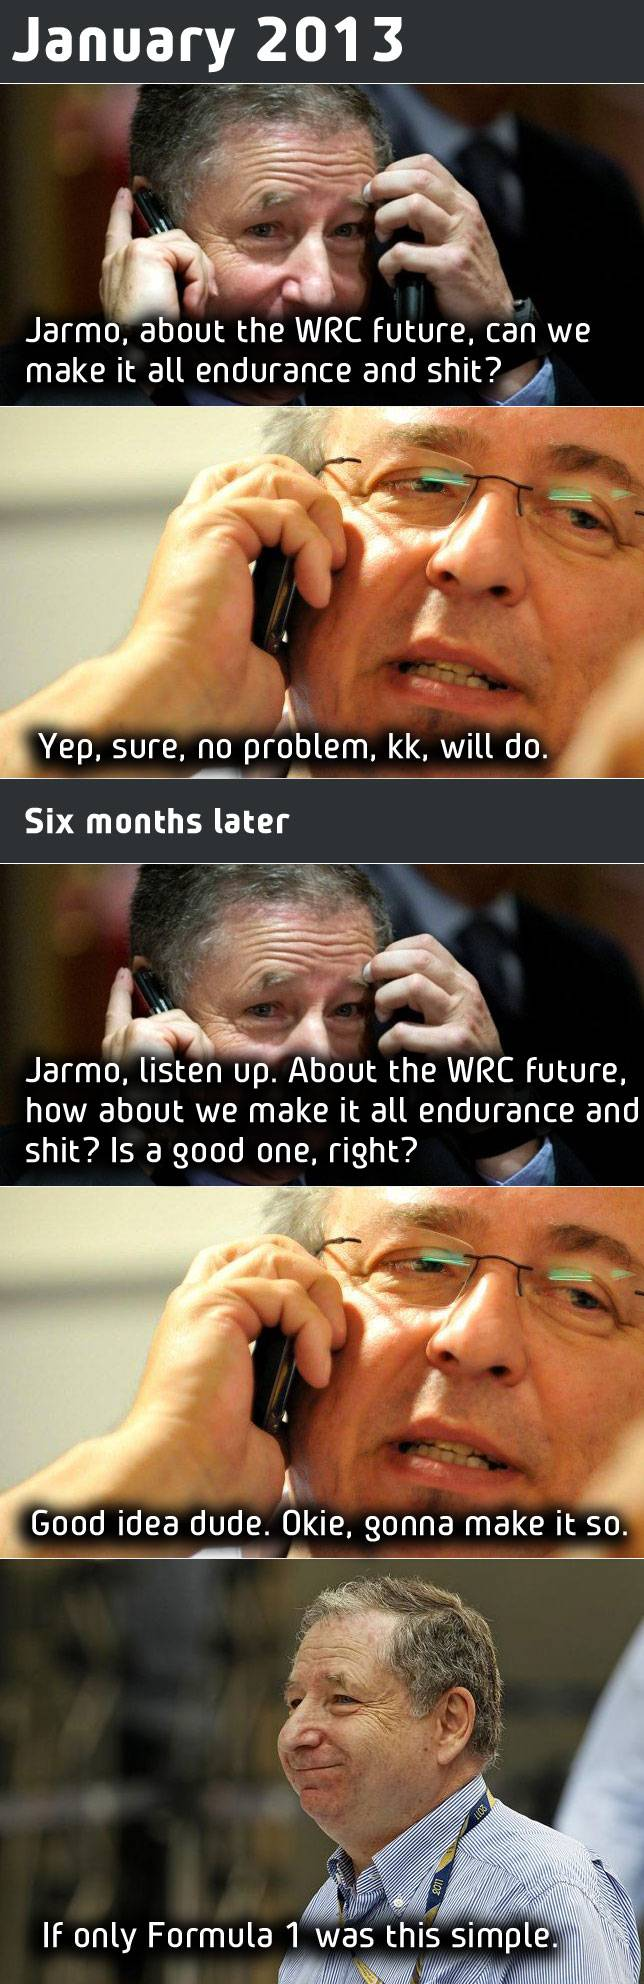 wrc future